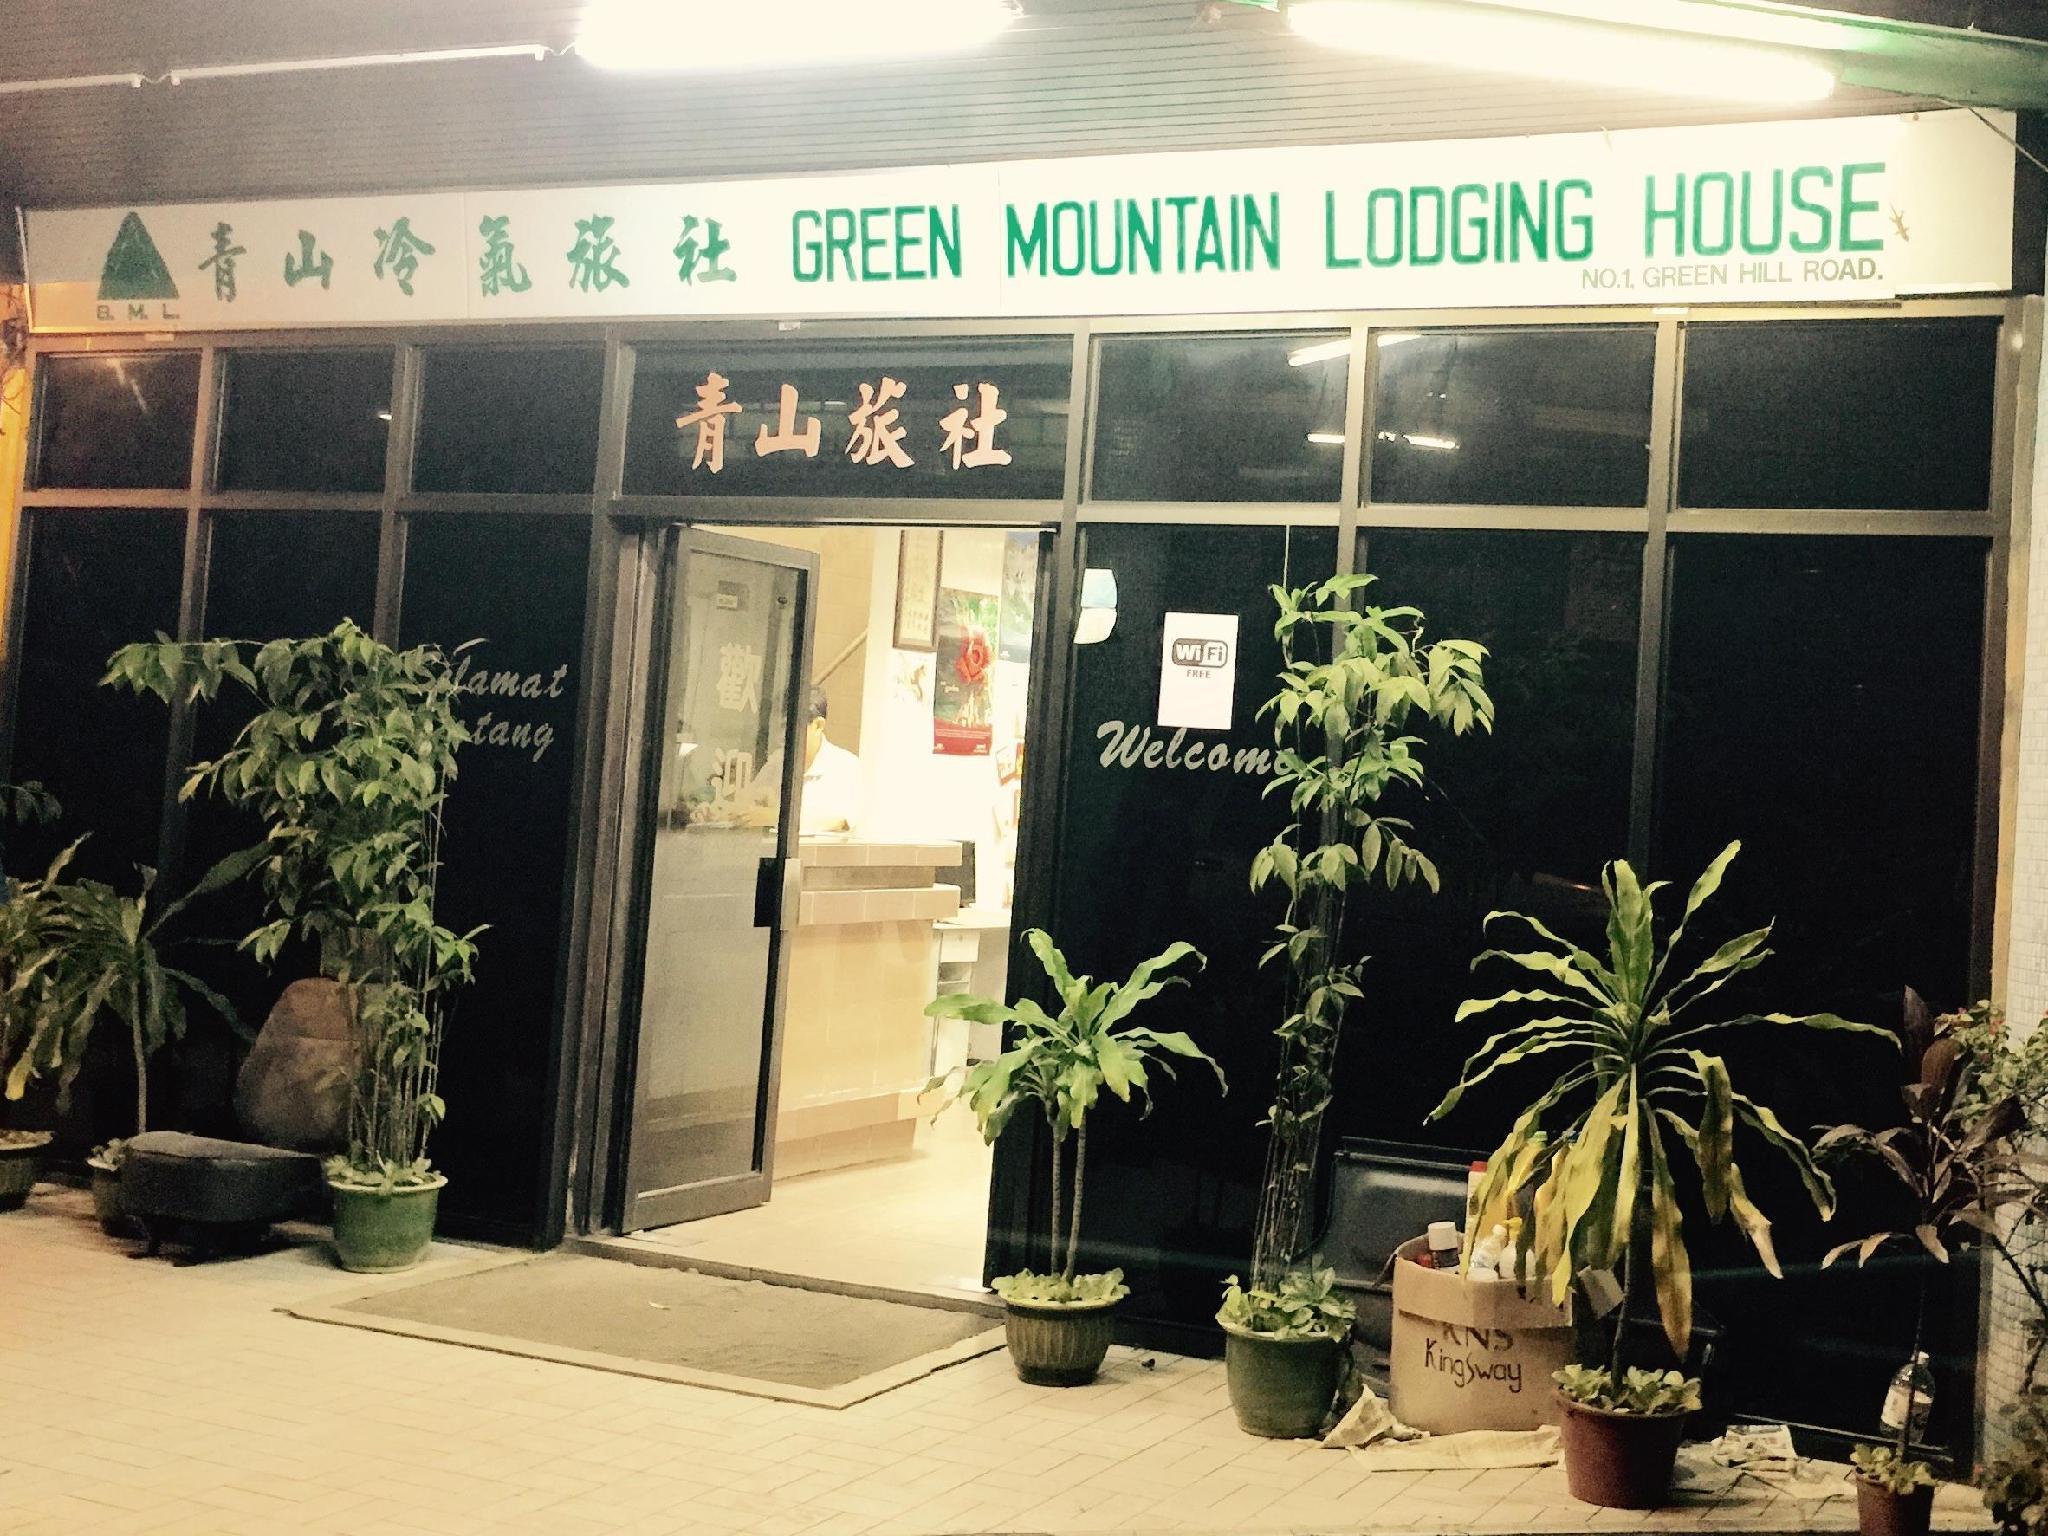 Green Mountain Lodging House